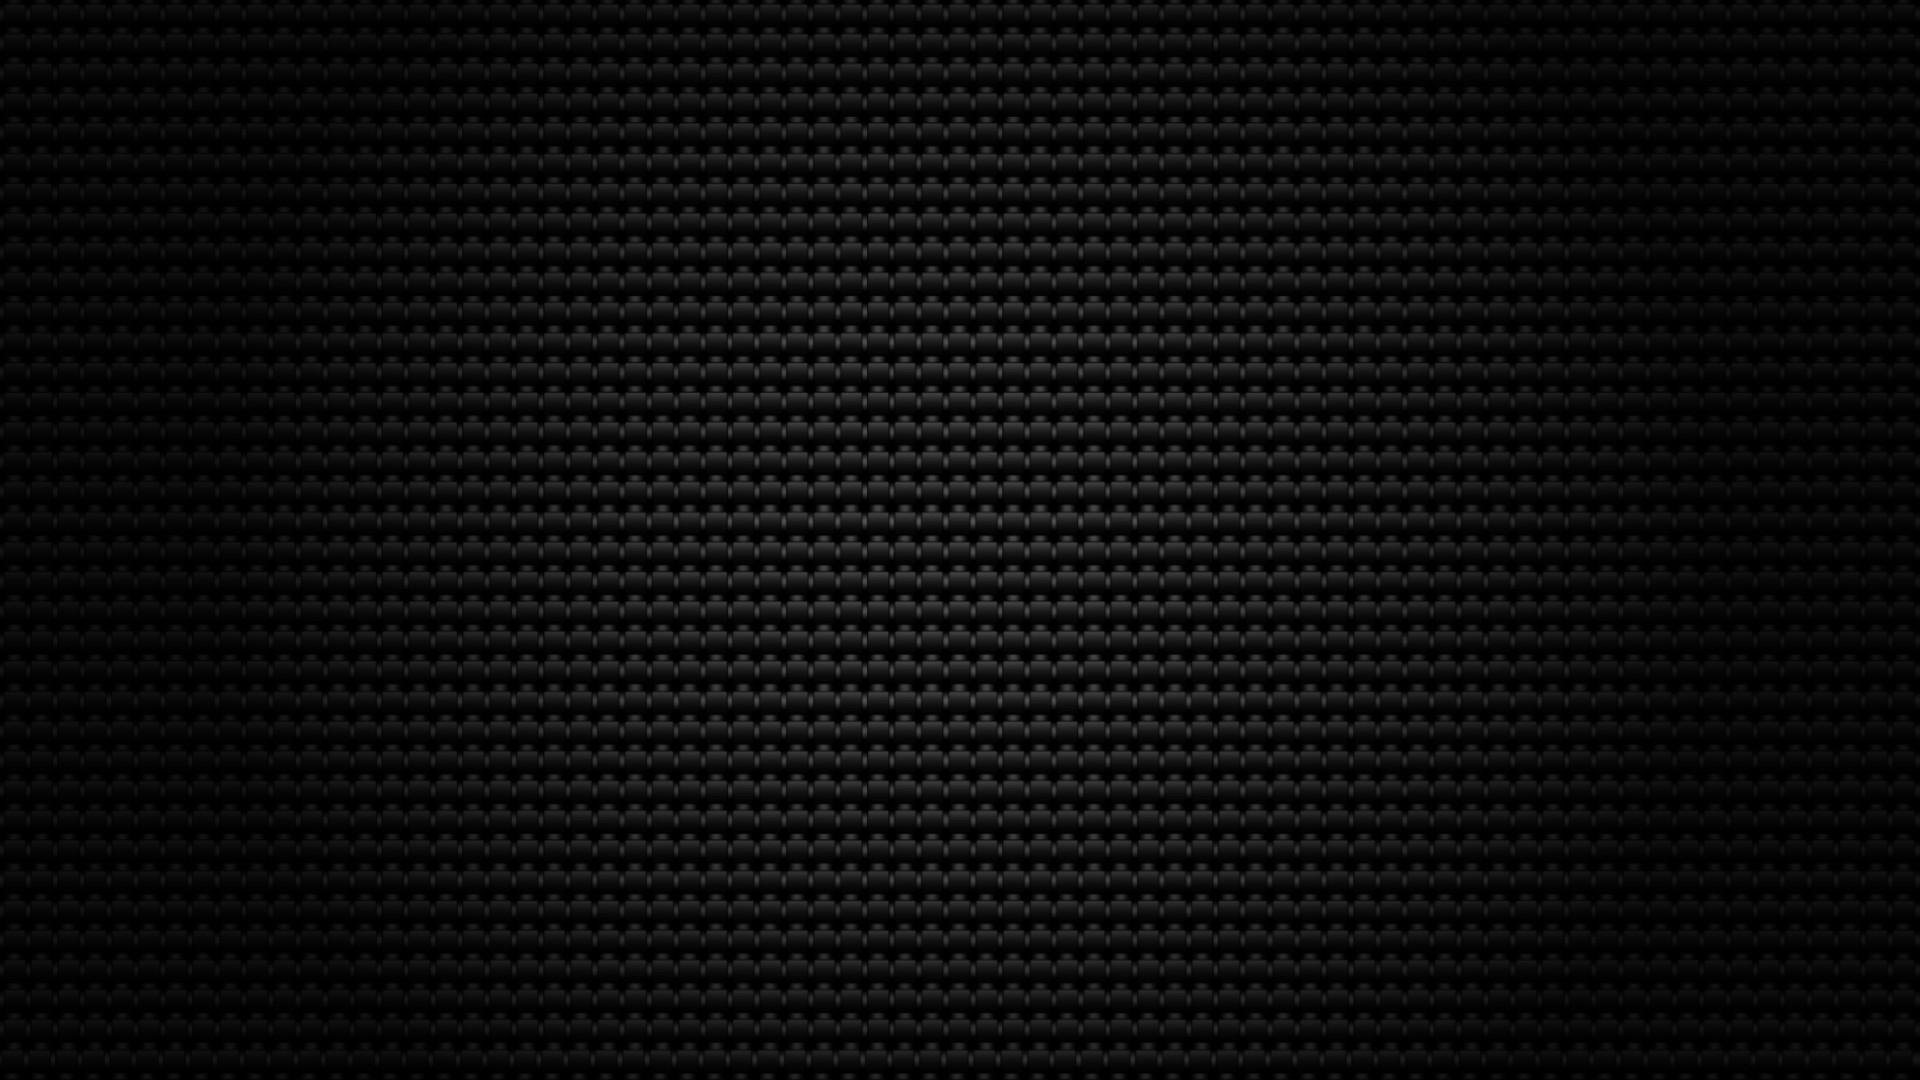 42 Carbon Fiber Wallpaper 1920x1080 On Wallpapersafari